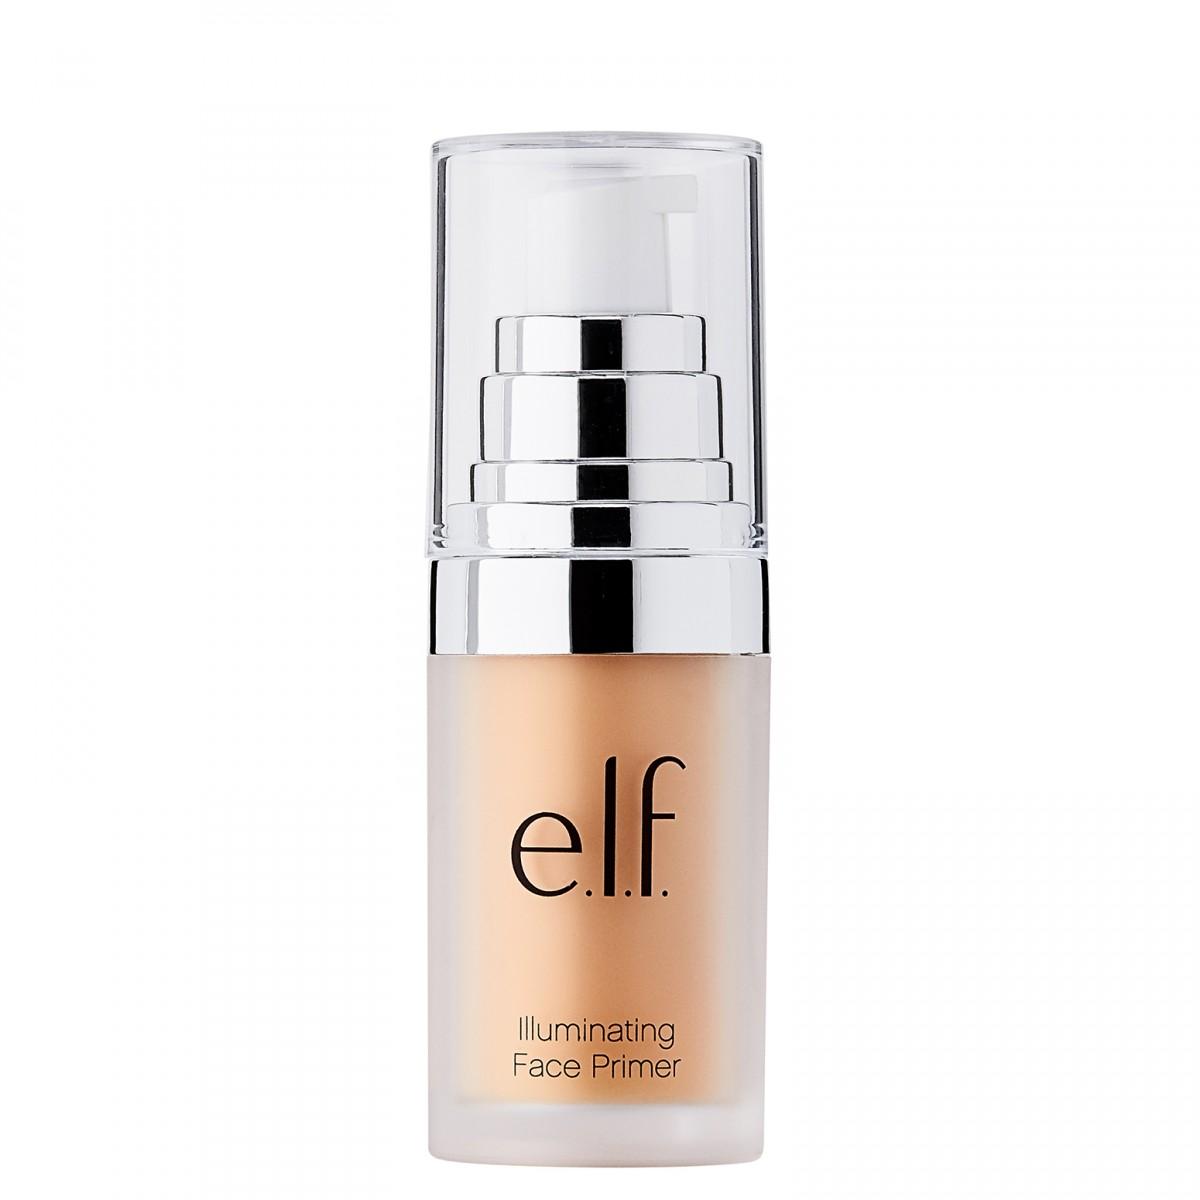 elf illuminating face primer how to use